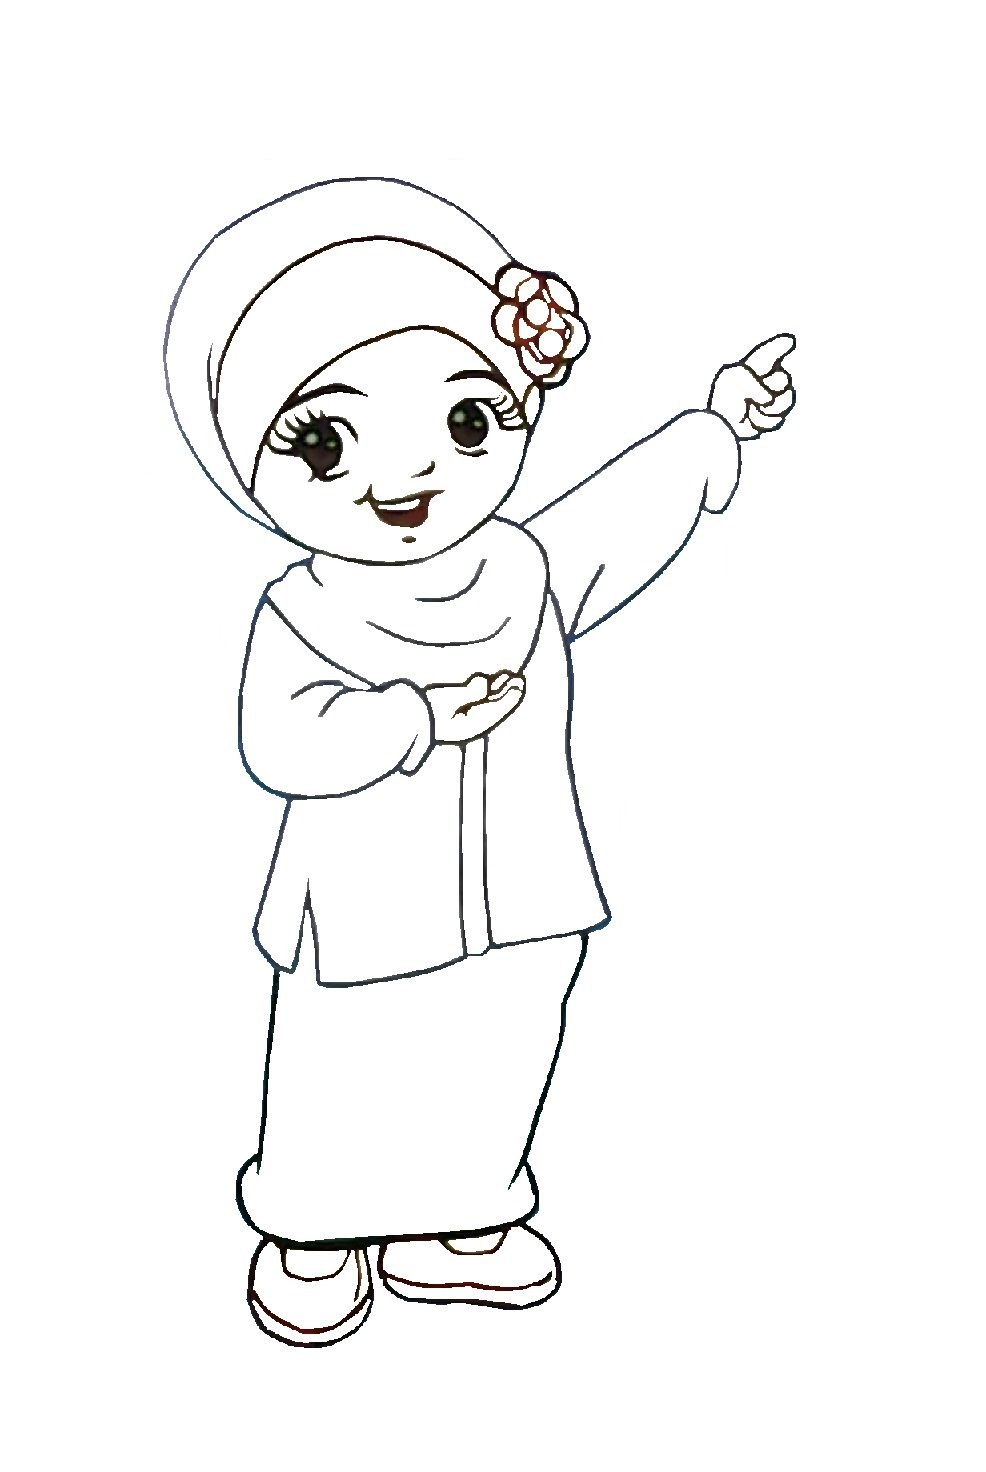 Mewarna Gambar Kartun Ustazah Muslimah